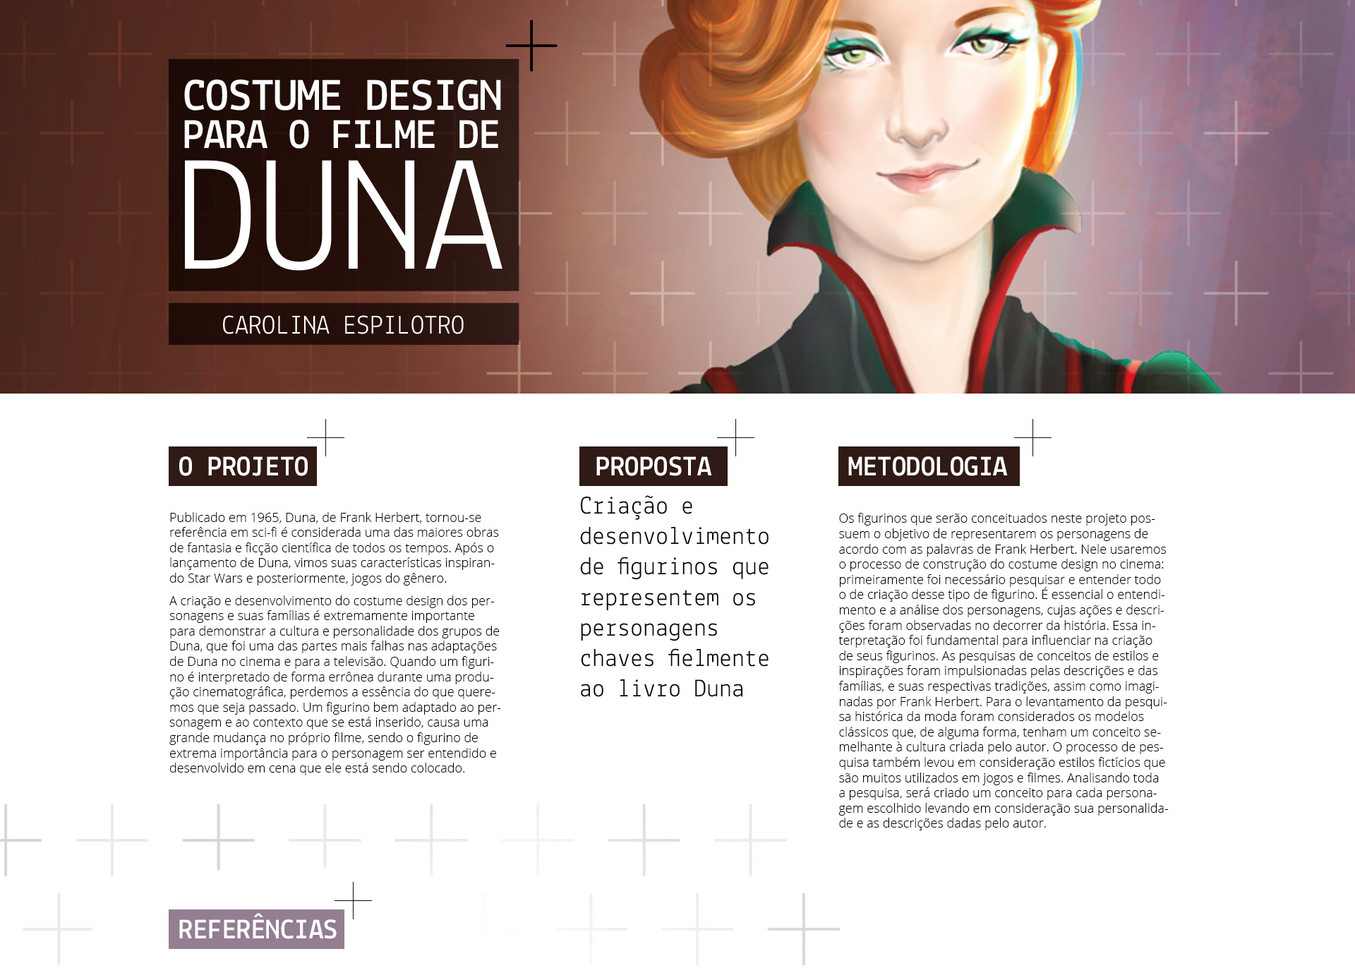 1_duna.jpg